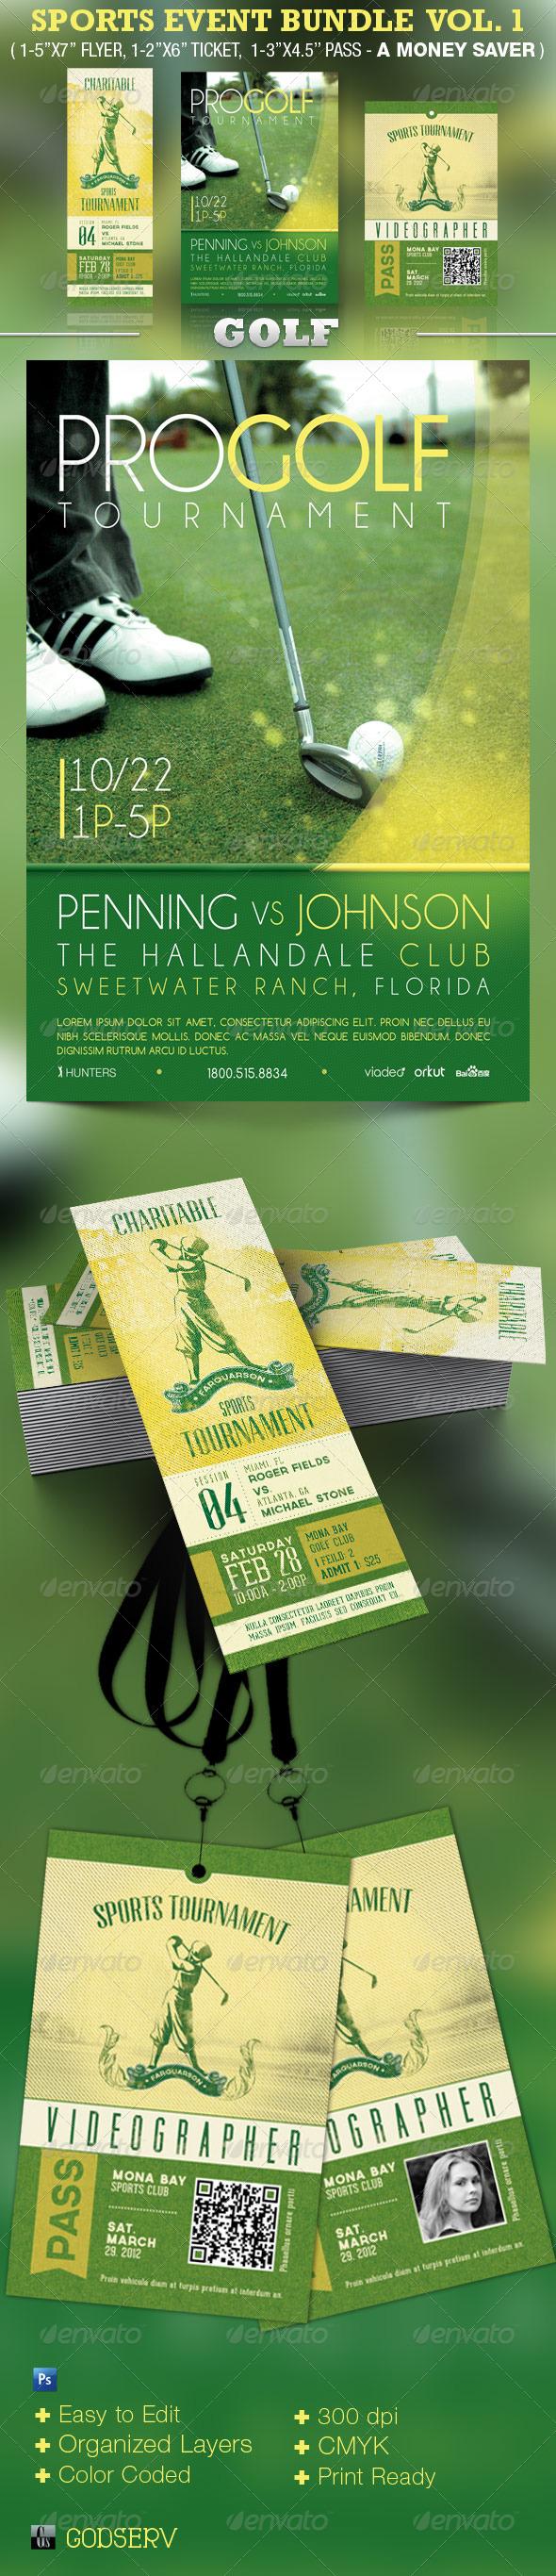 Sports Event Template Bundle Vol 1: Golf - Sports Events